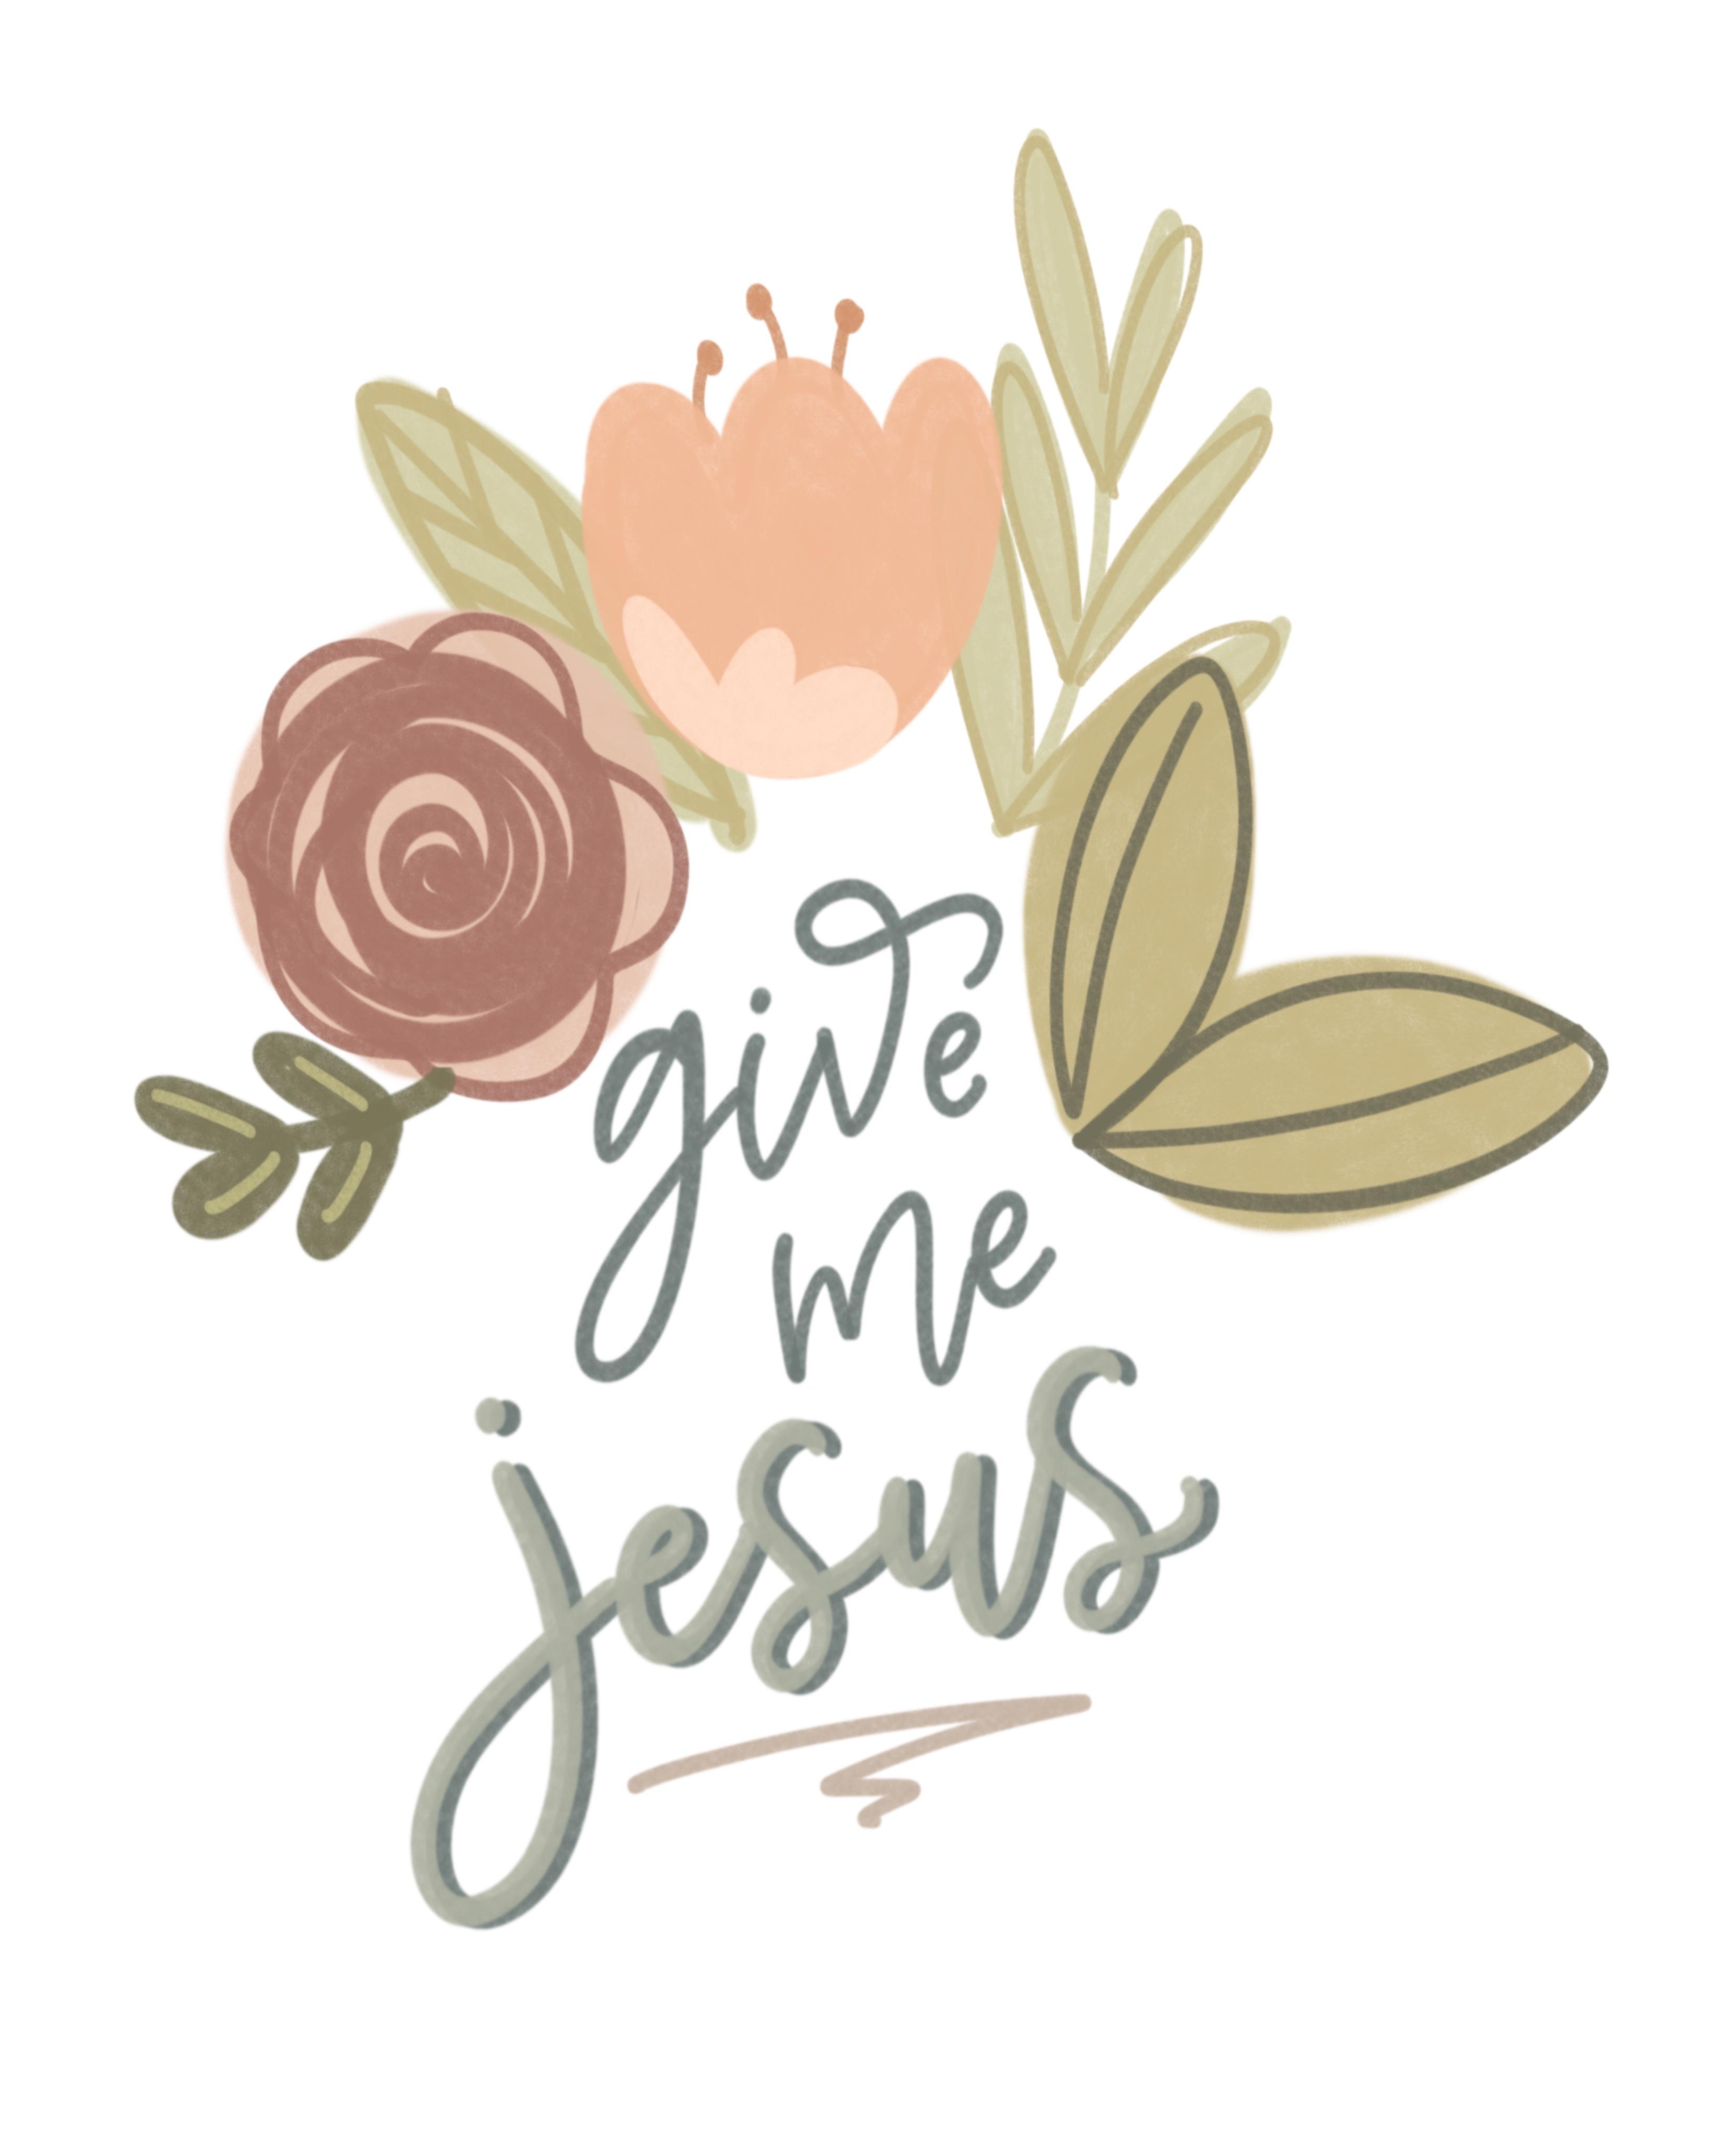 Give_Me_Jesus